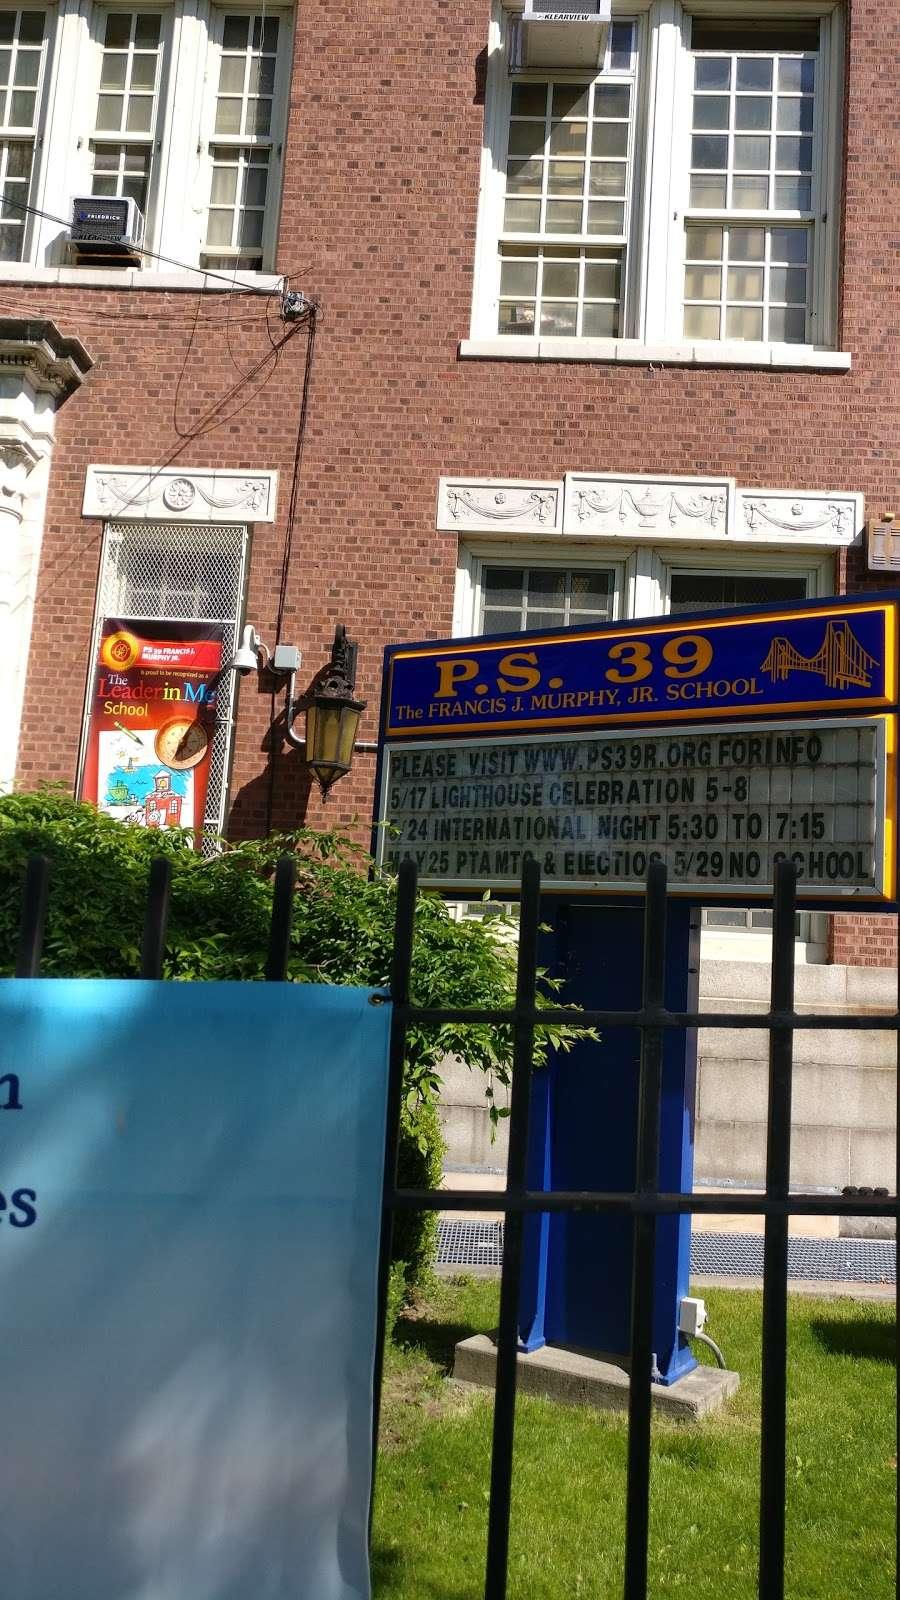 Public School 39 - school  | Photo 1 of 1 | Address: 71 Sand Ln, Staten Island, NY 10305, USA | Phone: (718) 447-4543